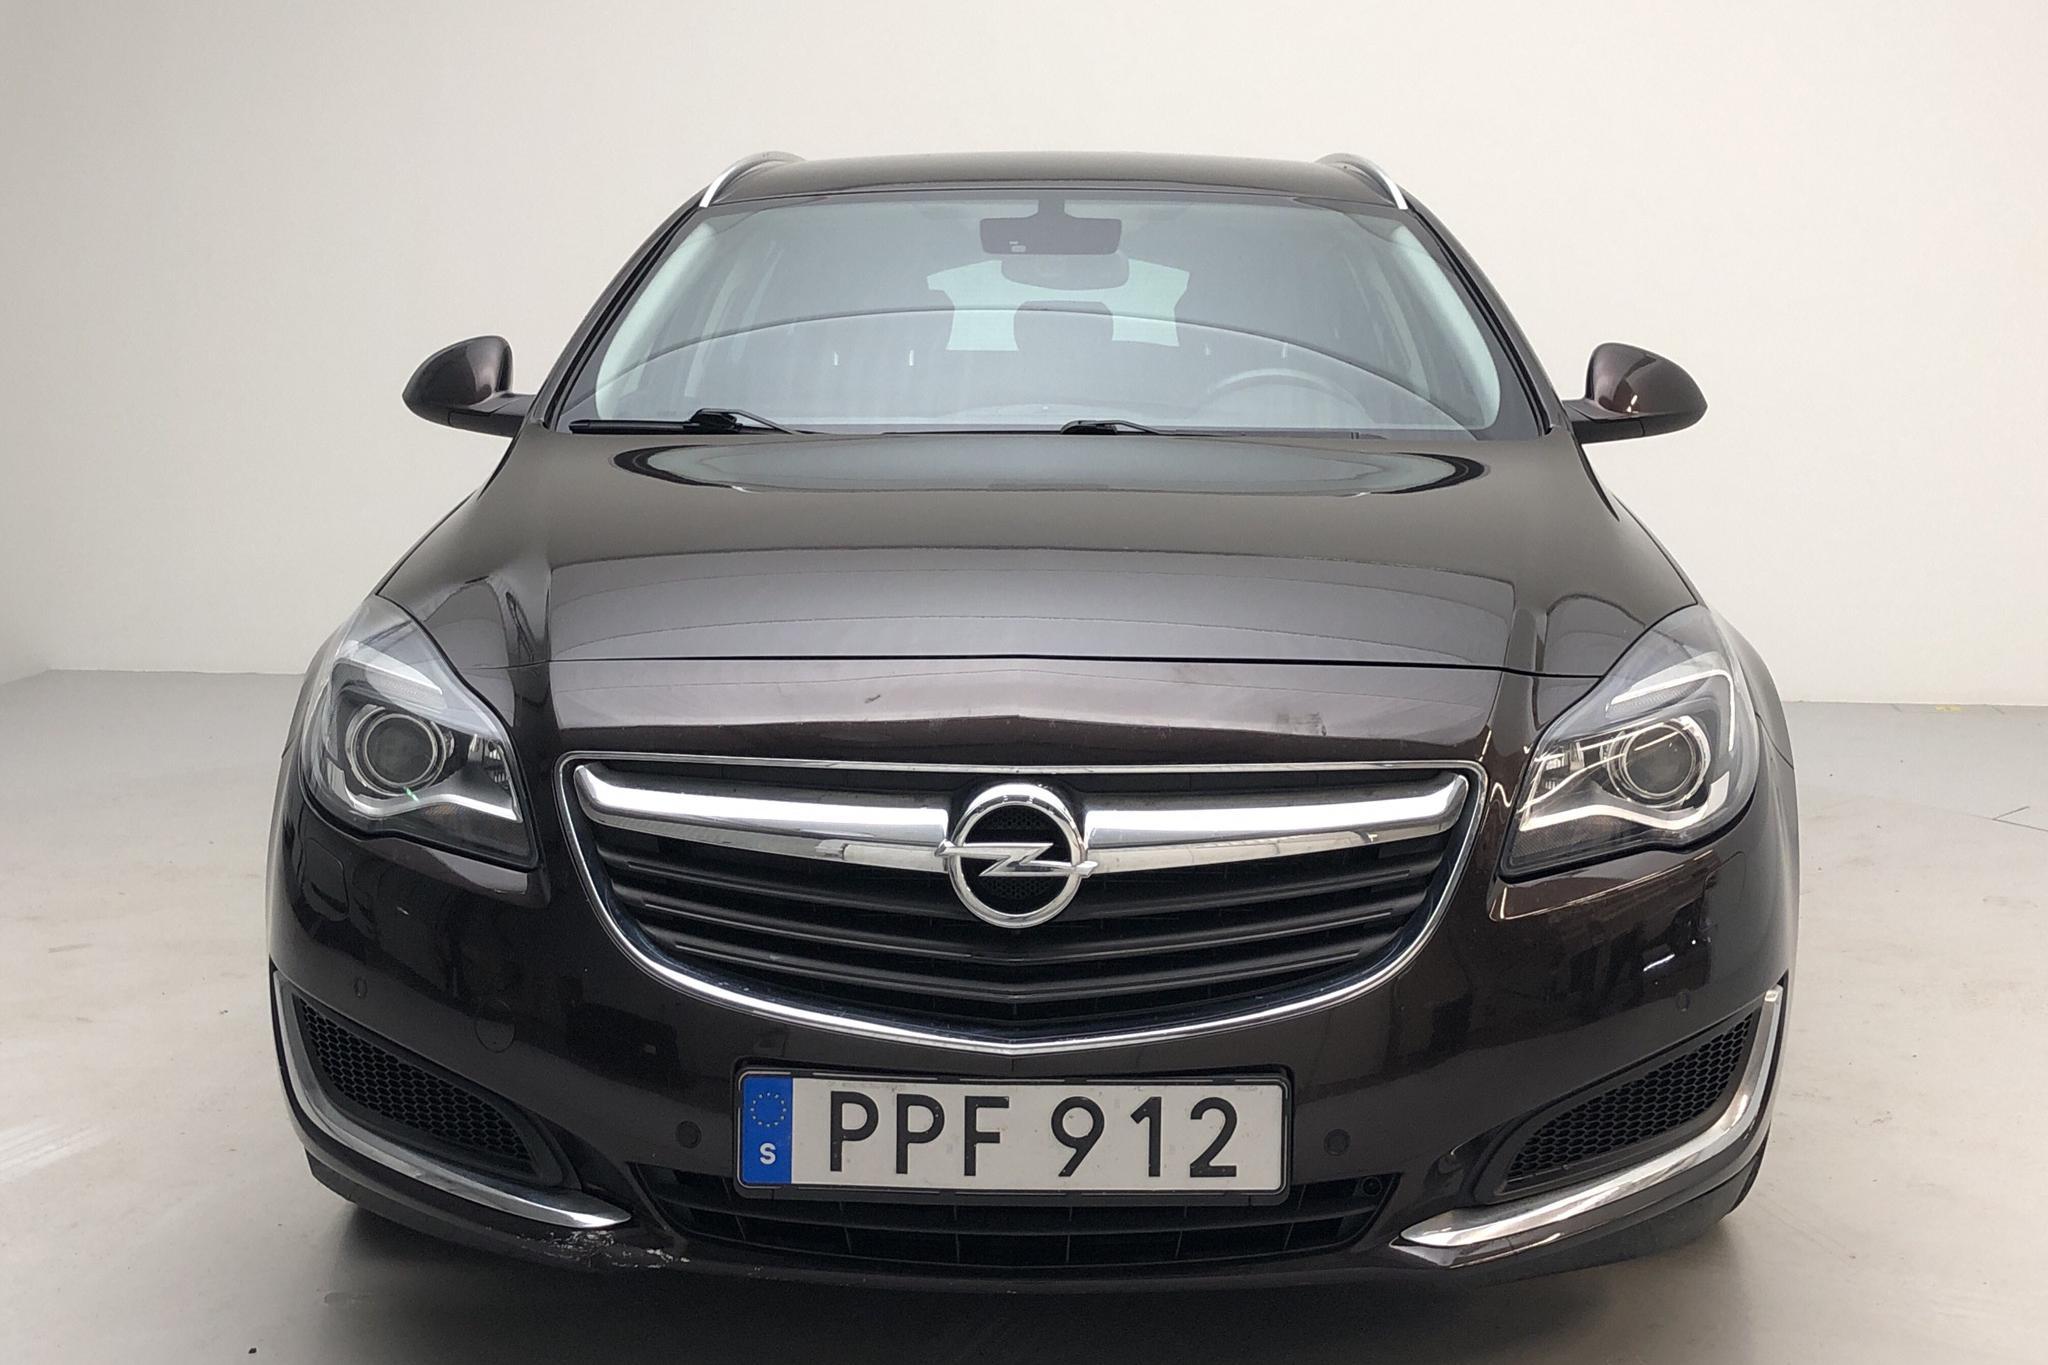 Opel Insignia 1.6 CDTI ecoFLEX Sports Tourer (136hk) - 8 306 mil - Automat - brun - 2016